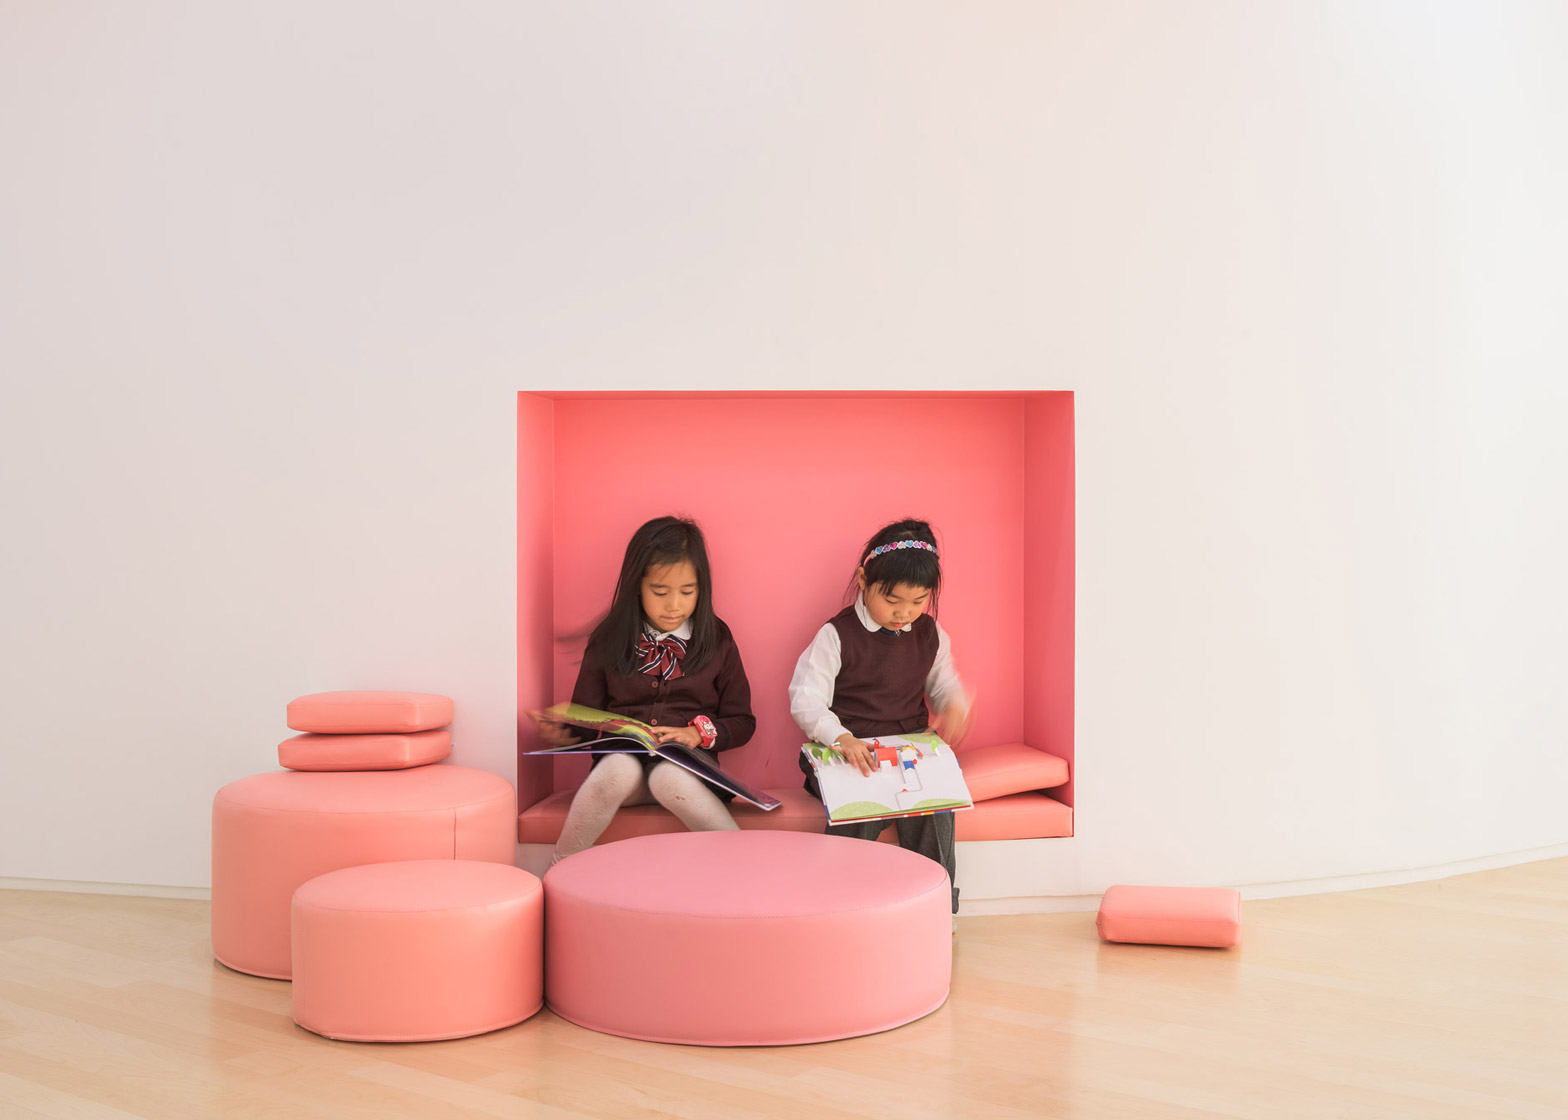 Flower Kindergarten by Jungmin Nam